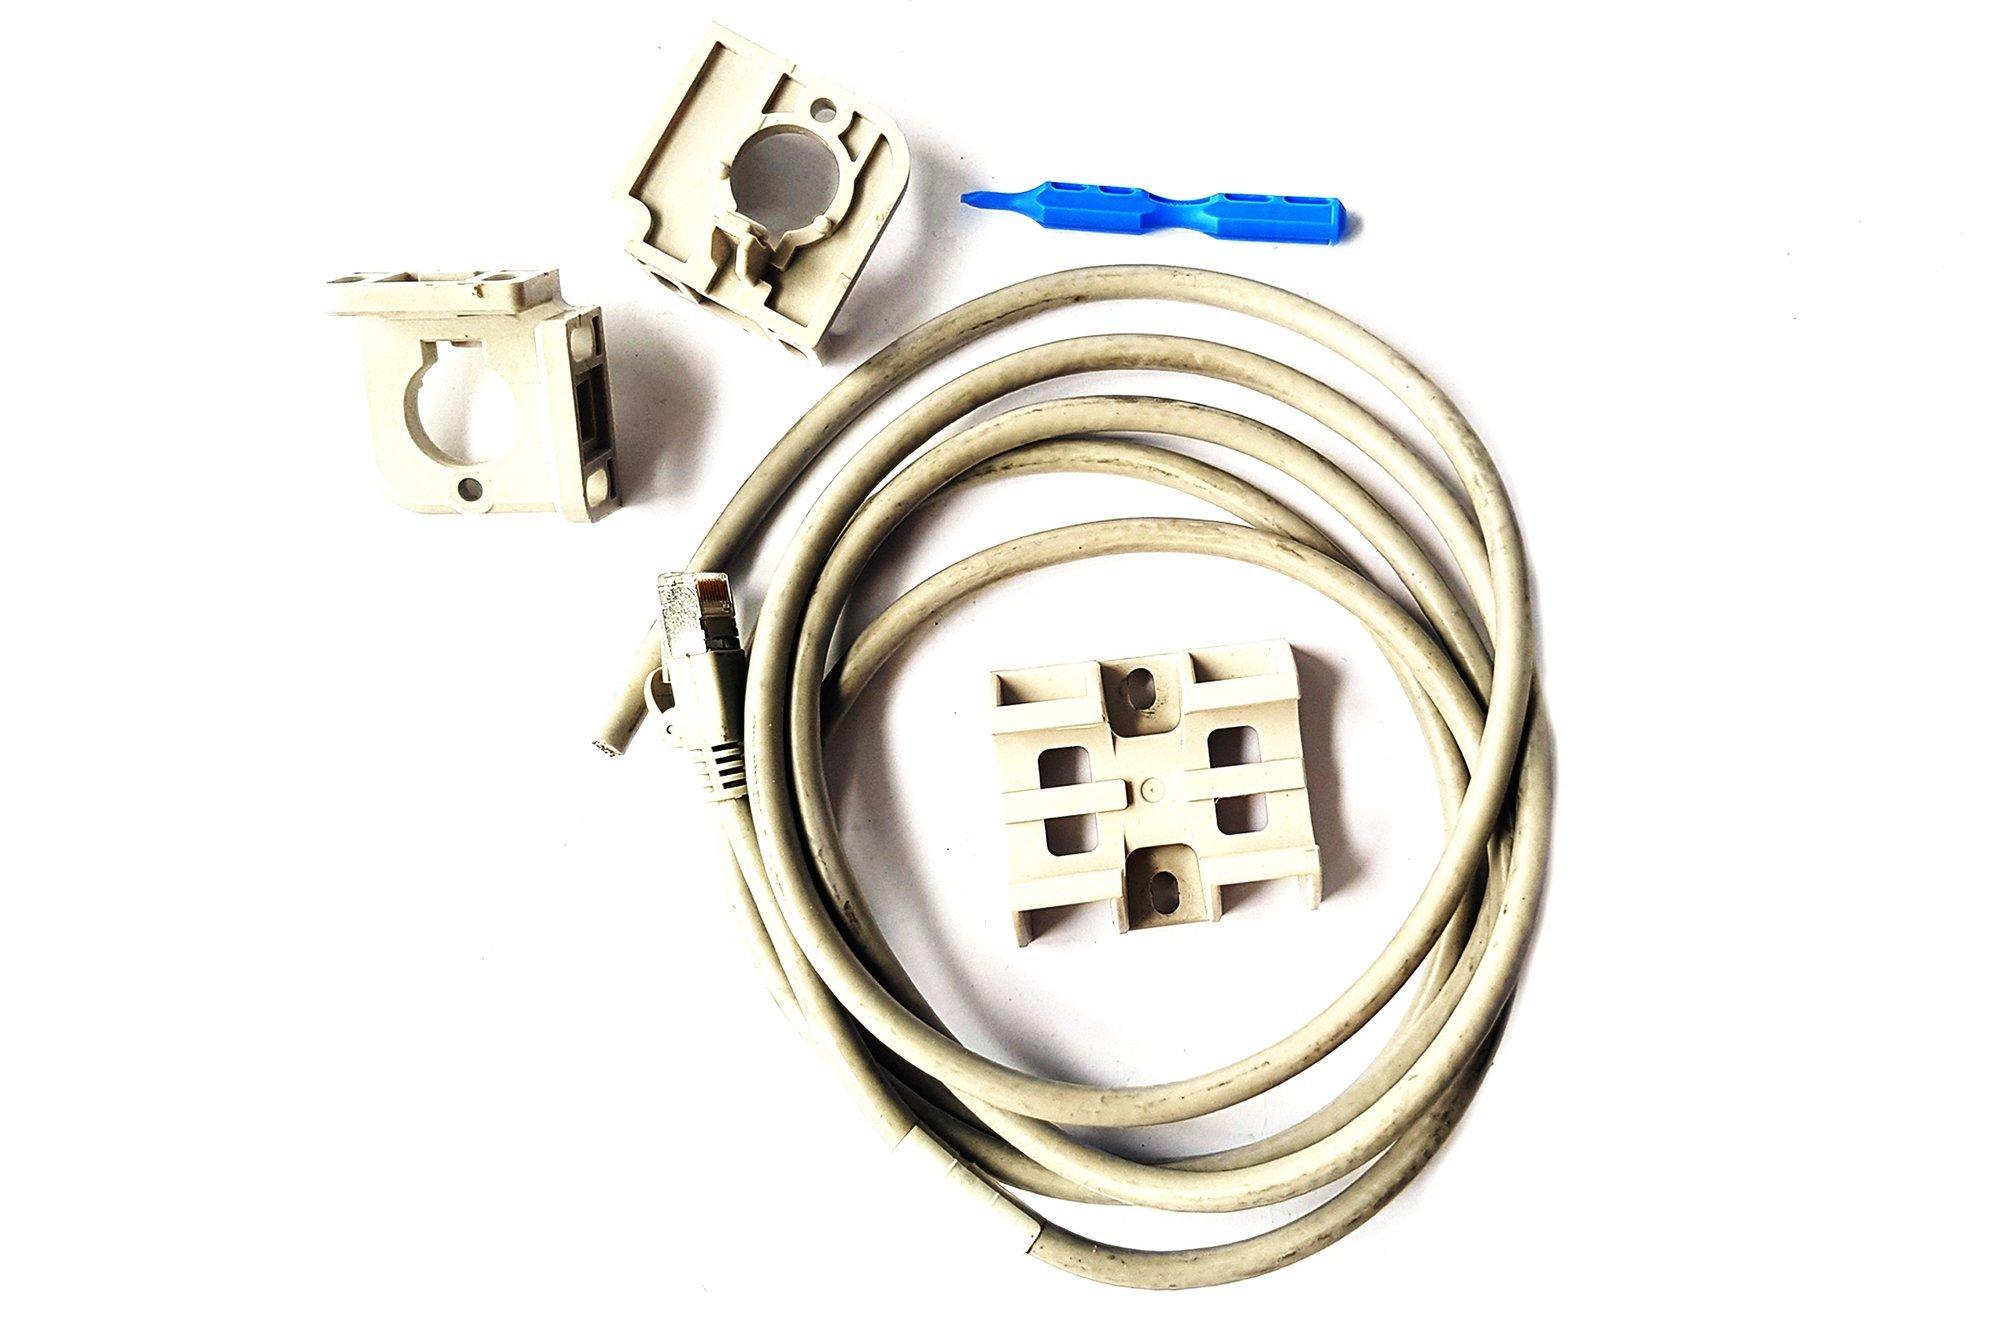 Keyence 10-pin I/O Power Cable 2 m SJ-C2U